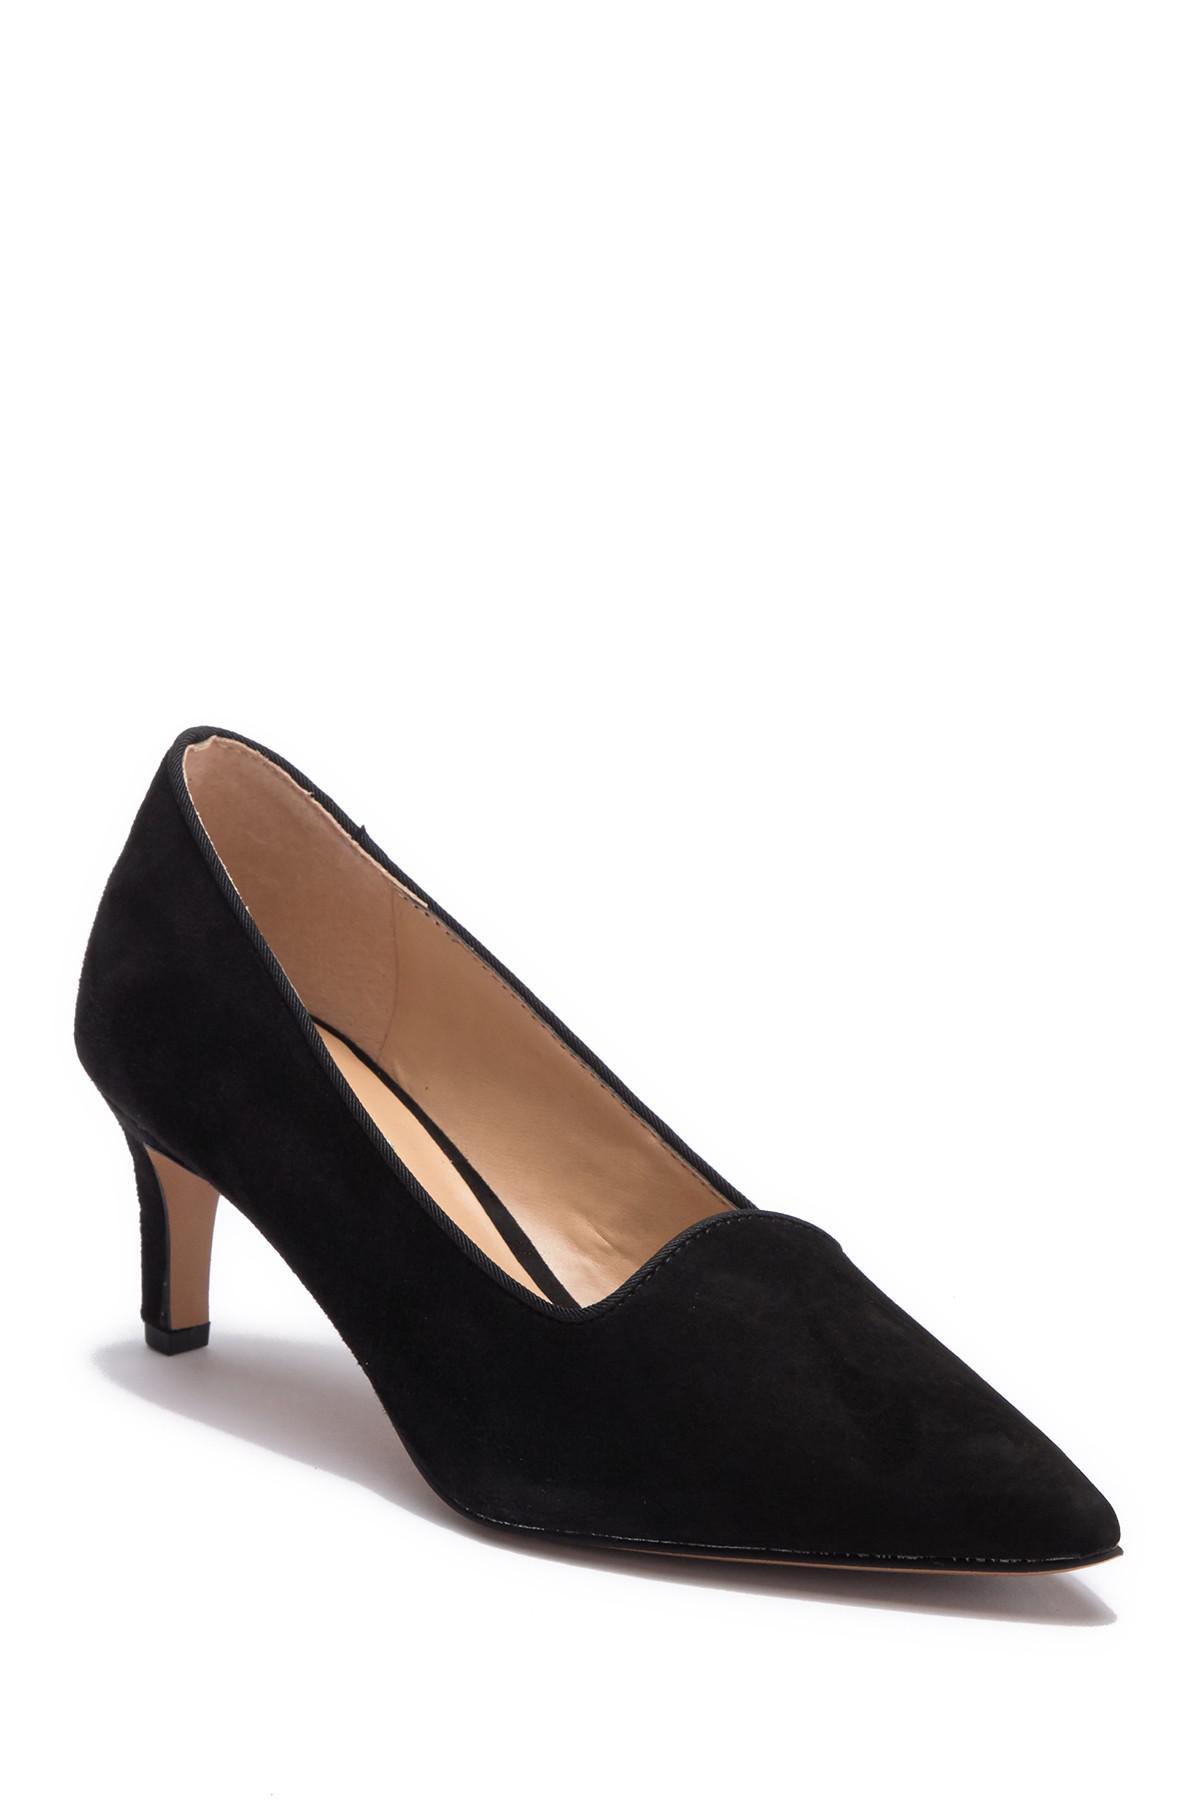 87bc76d4b08 Lyst - Franco Sarto Danelly Suede Kitten Heel Pump in Black - Save 45%